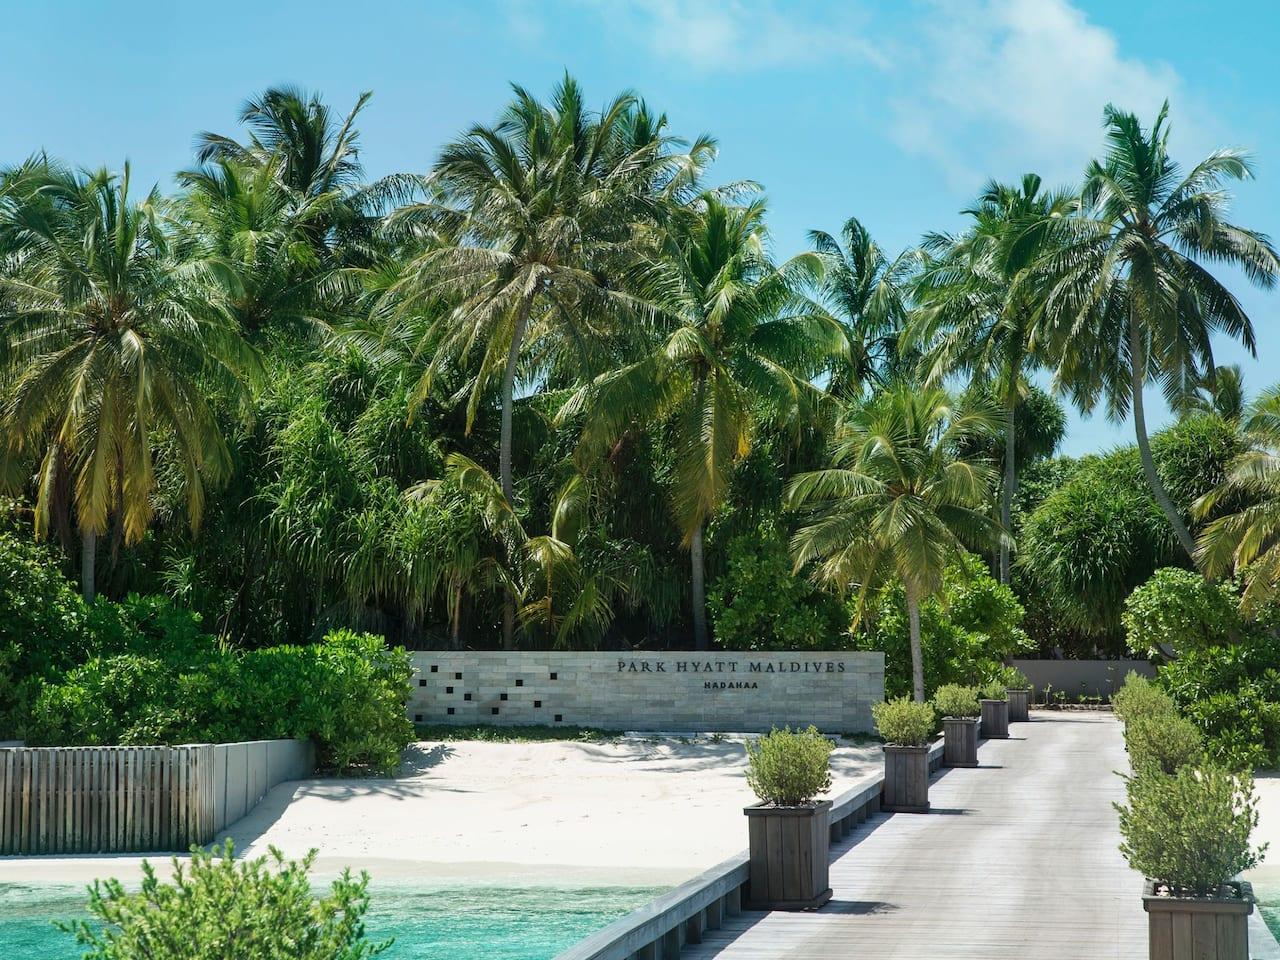 Best luxury Maldives resort Park Hyatt Maldives